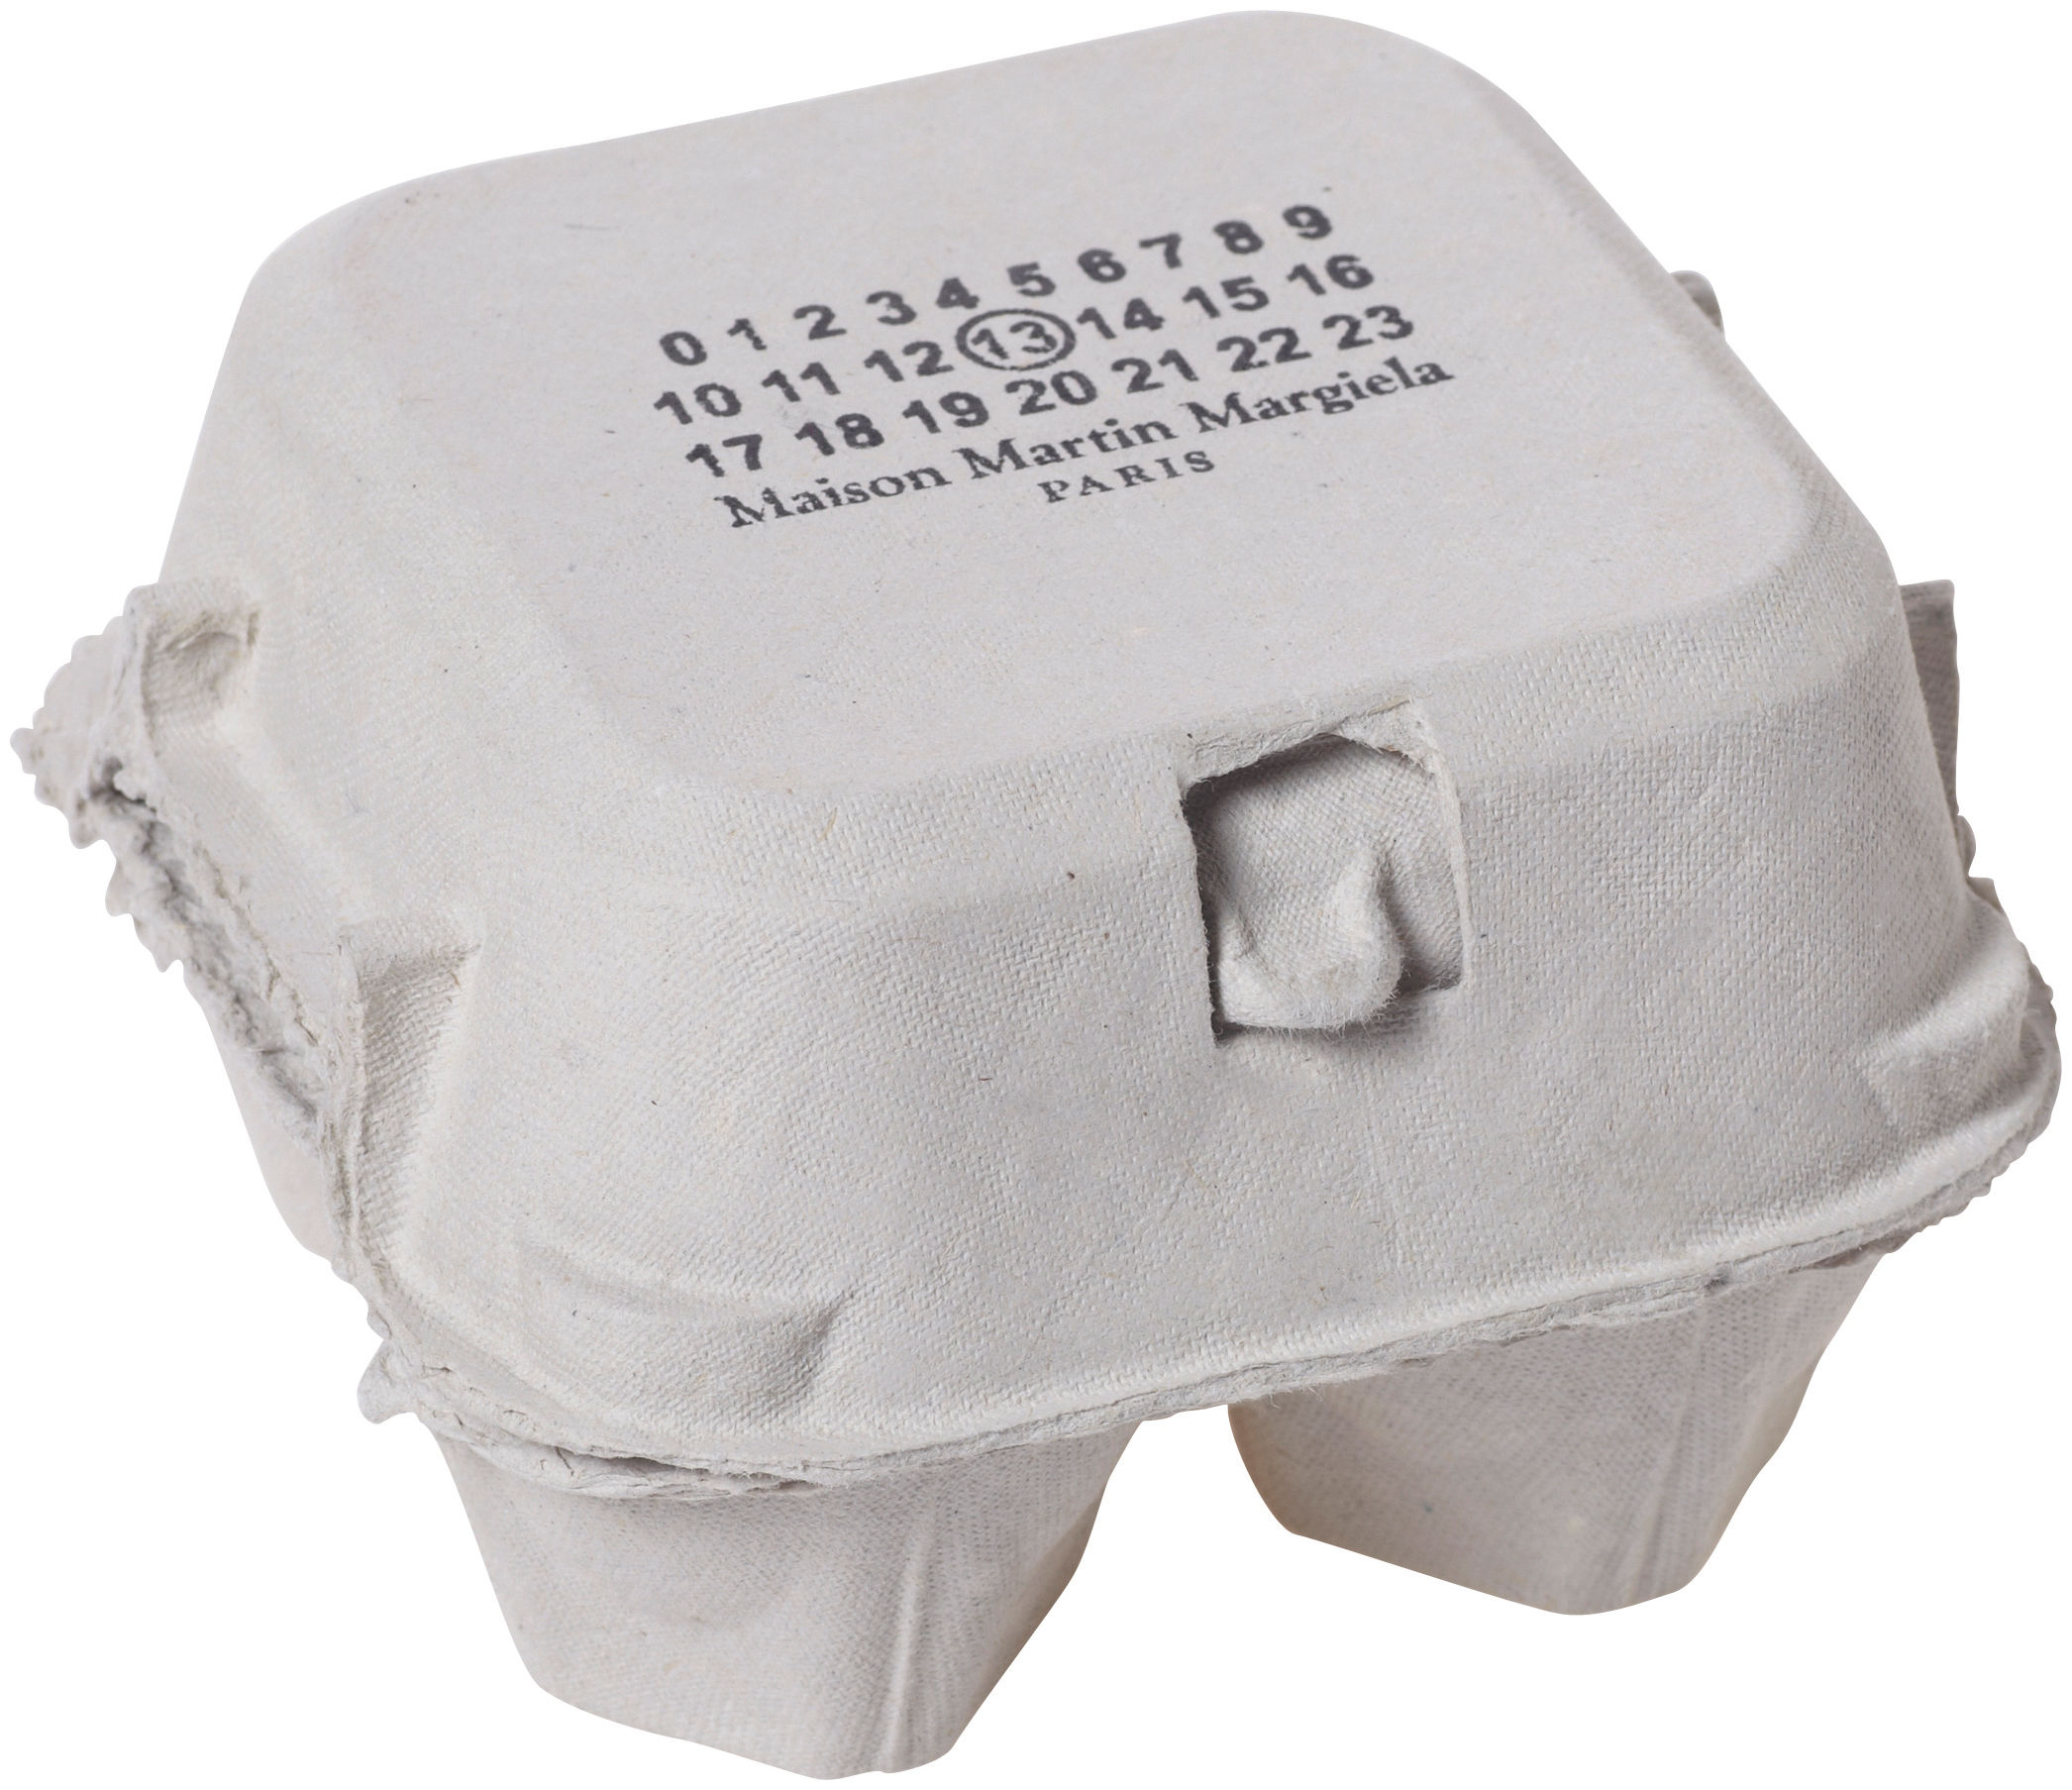 Fortune egg box white by maison martin margiela for Maison martin margiela